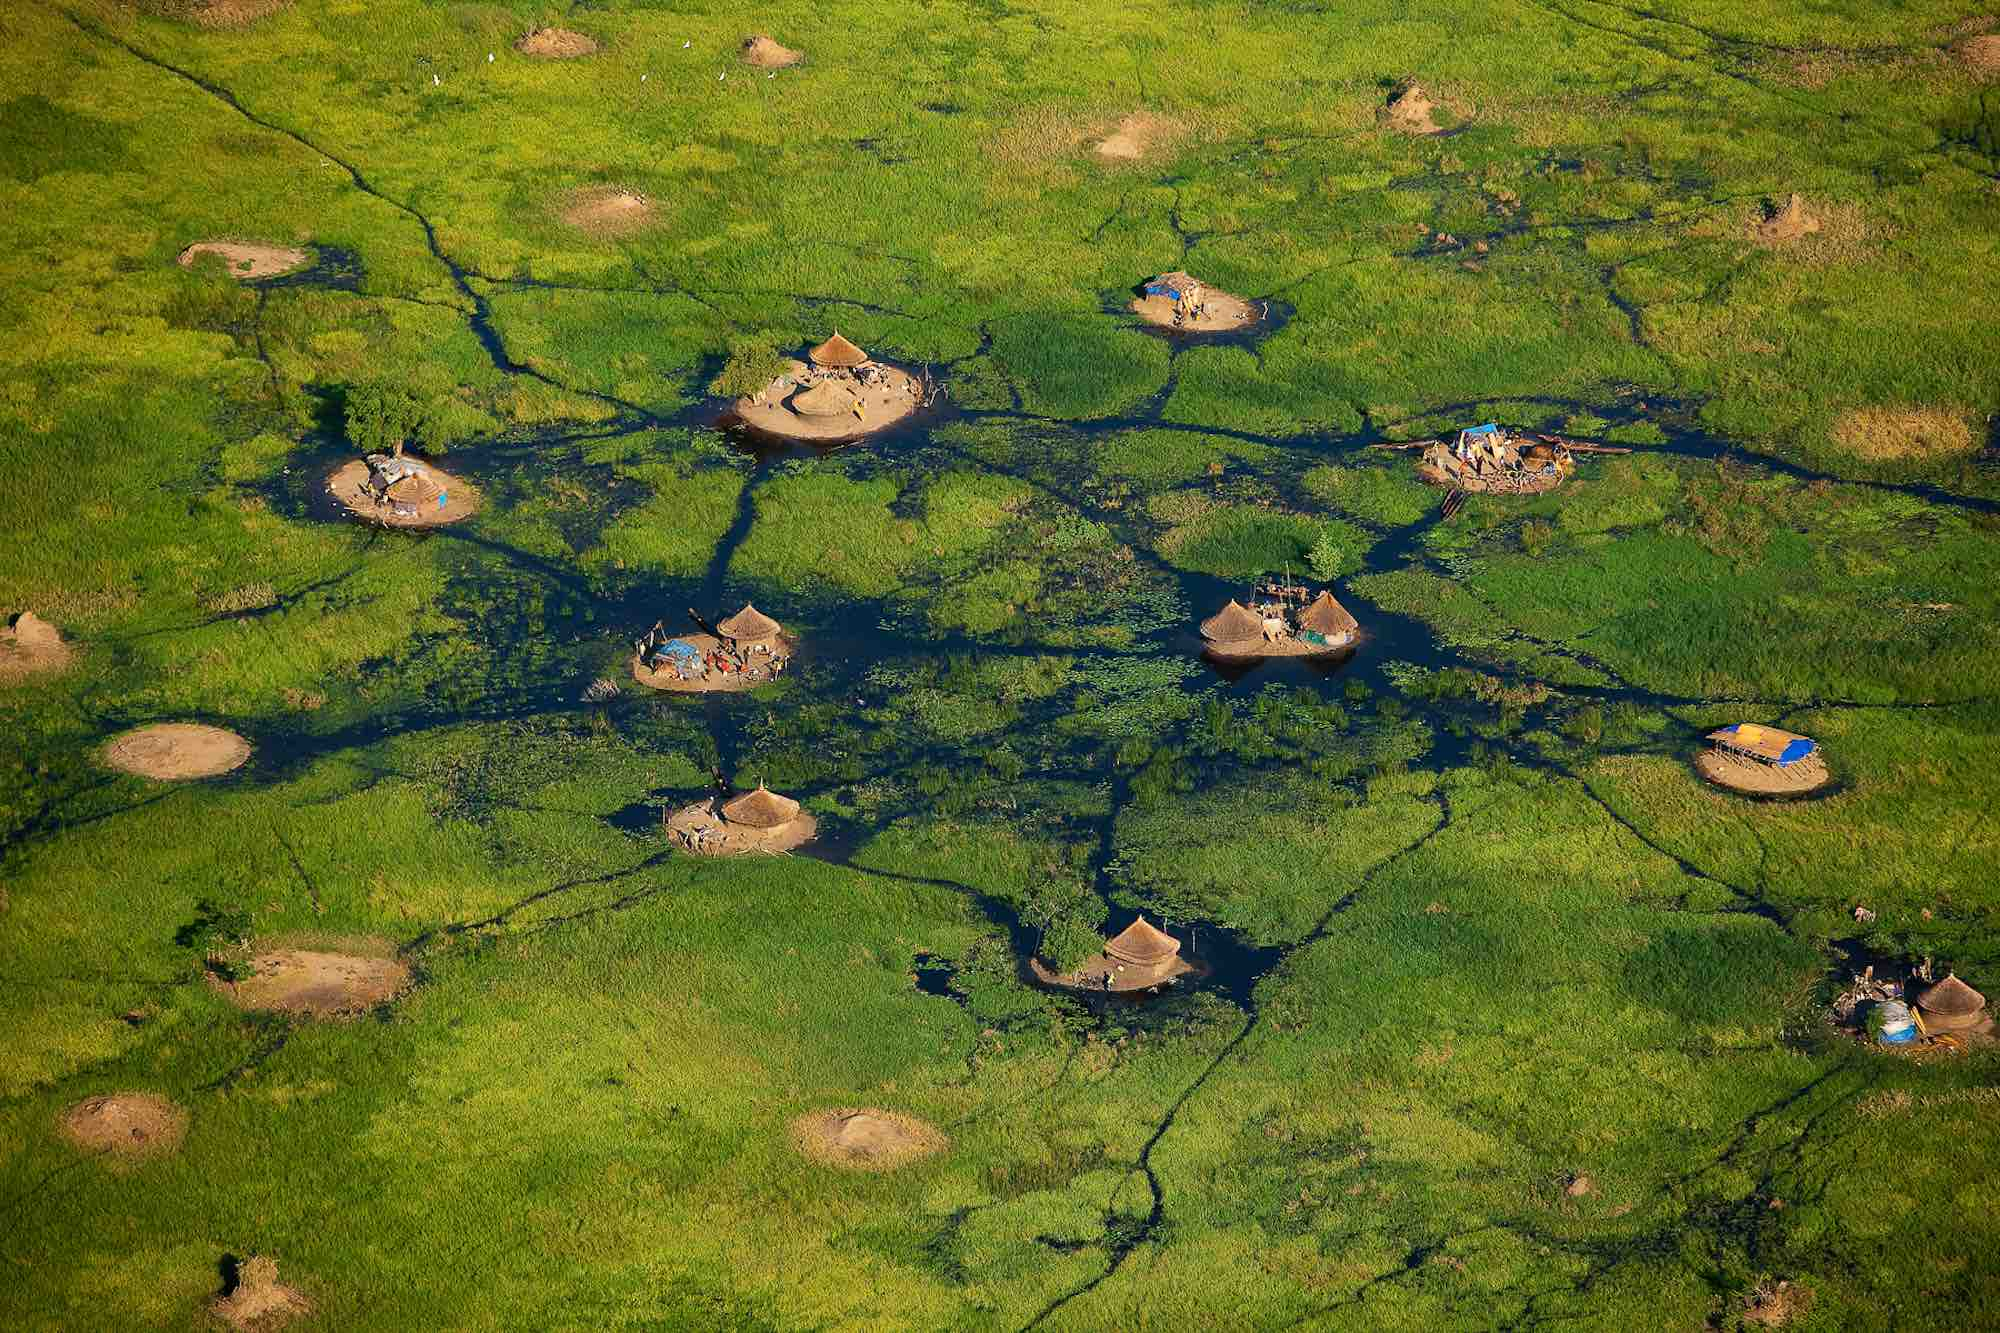 Swamps - Yann Arthus-Bertrand